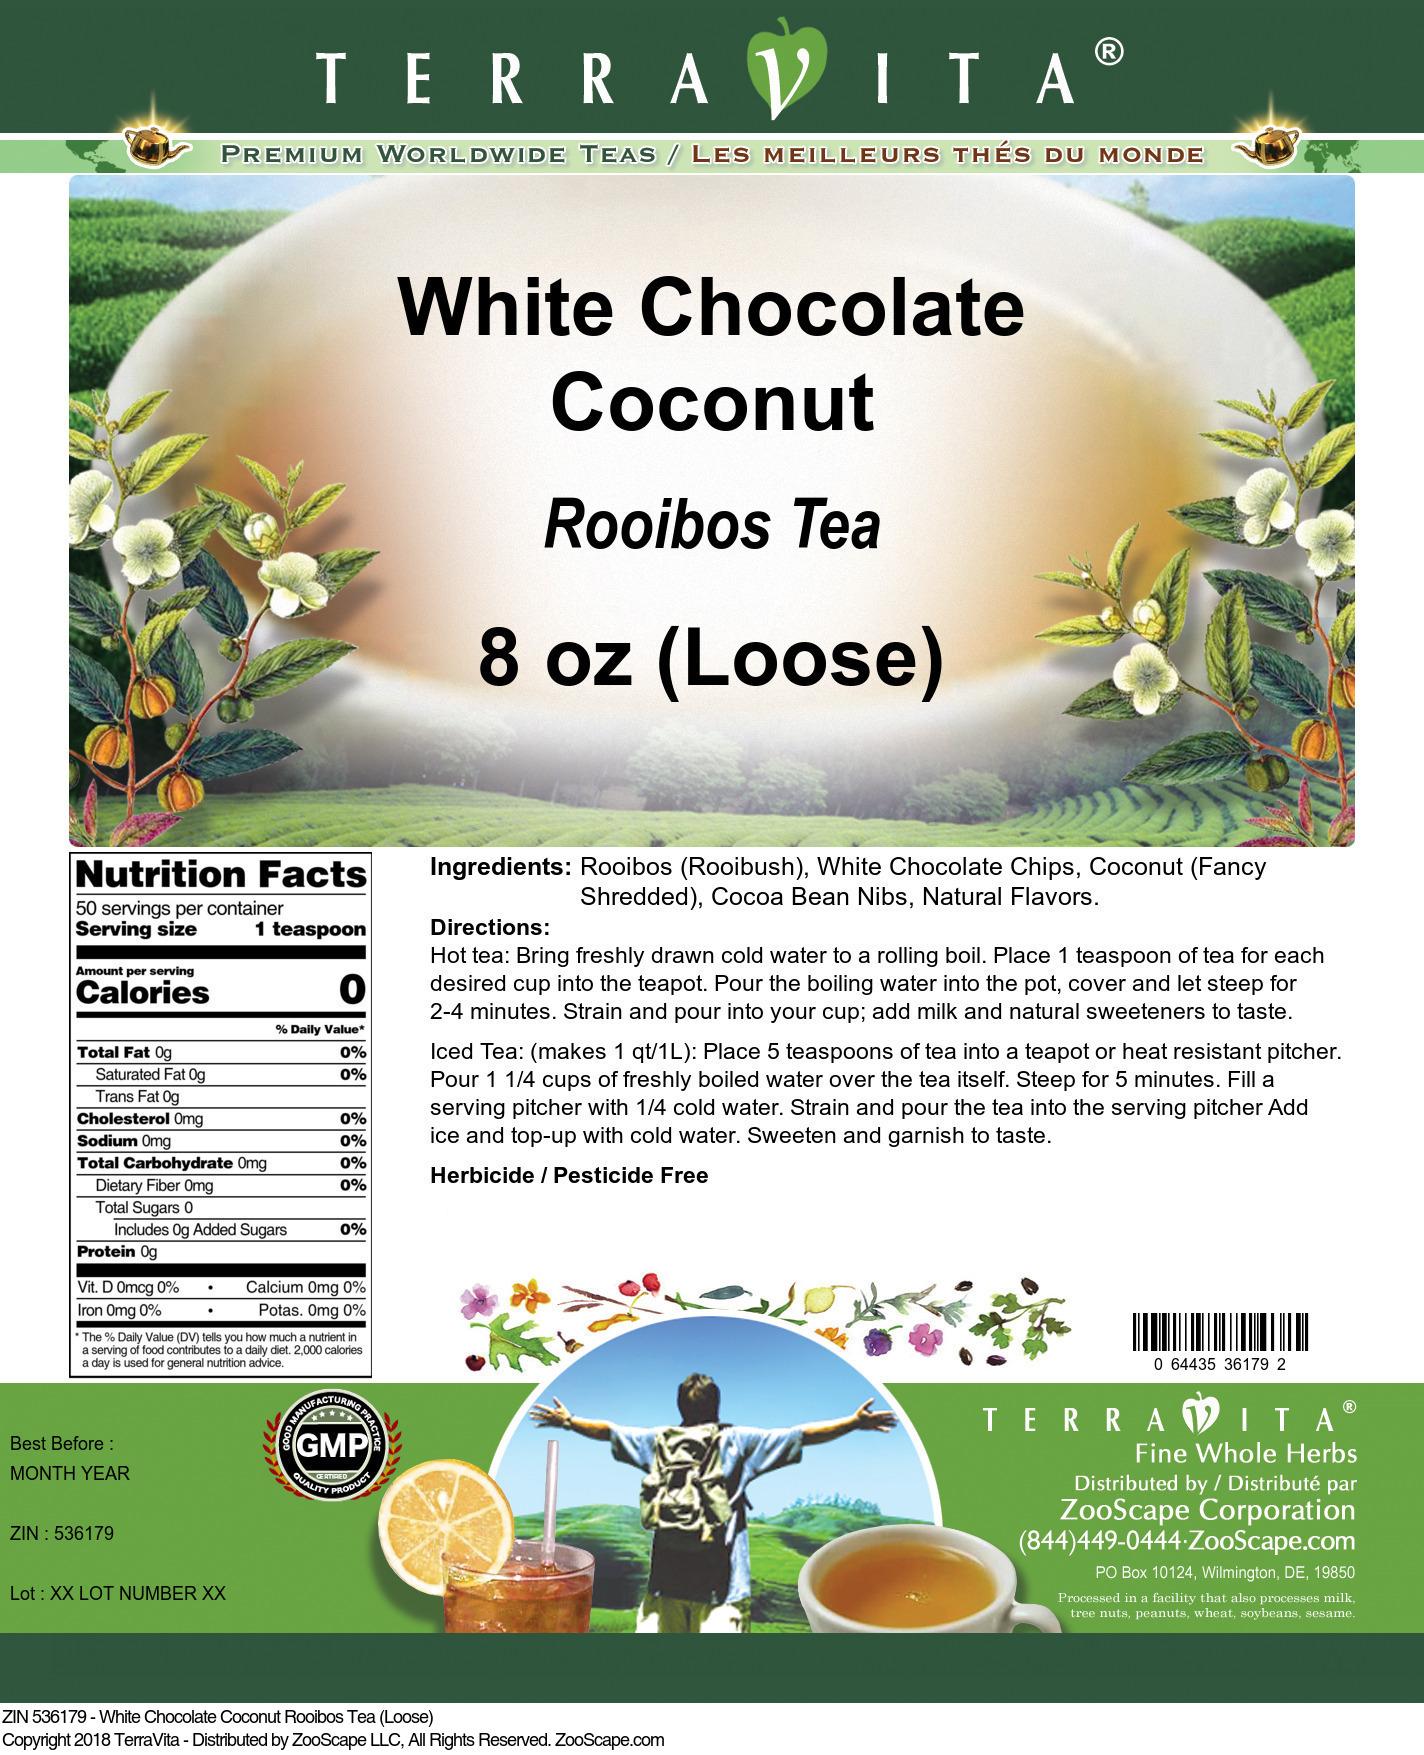 White Chocolate Coconut Rooibos Tea